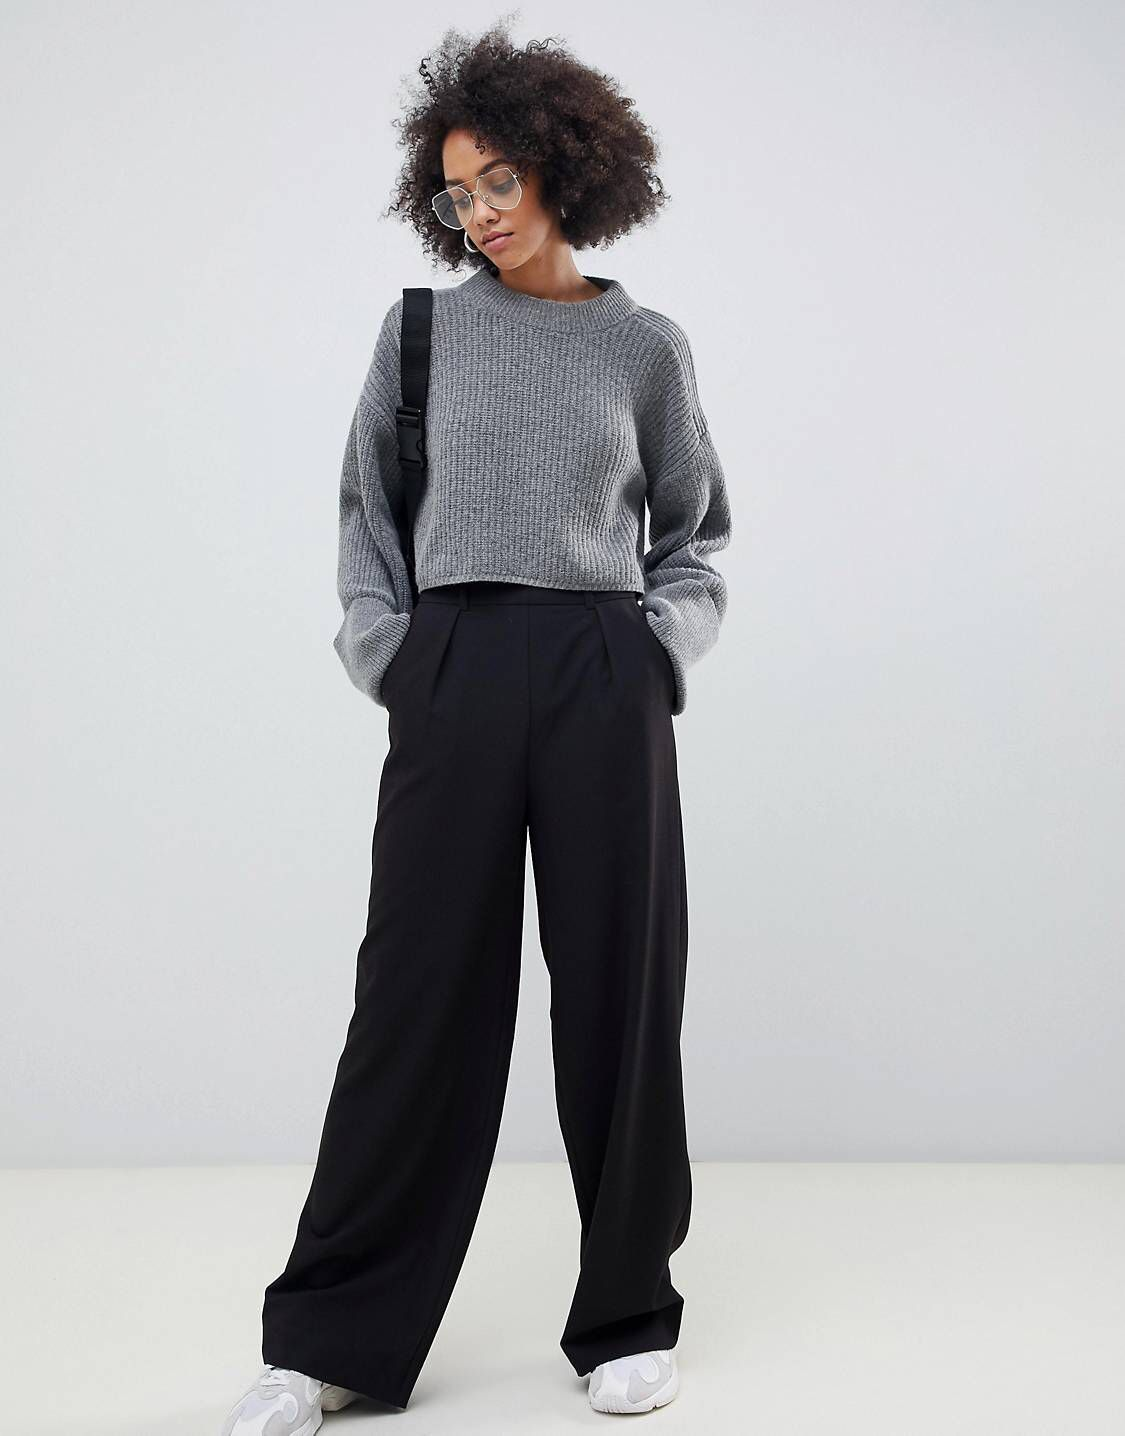 Breite Hosen